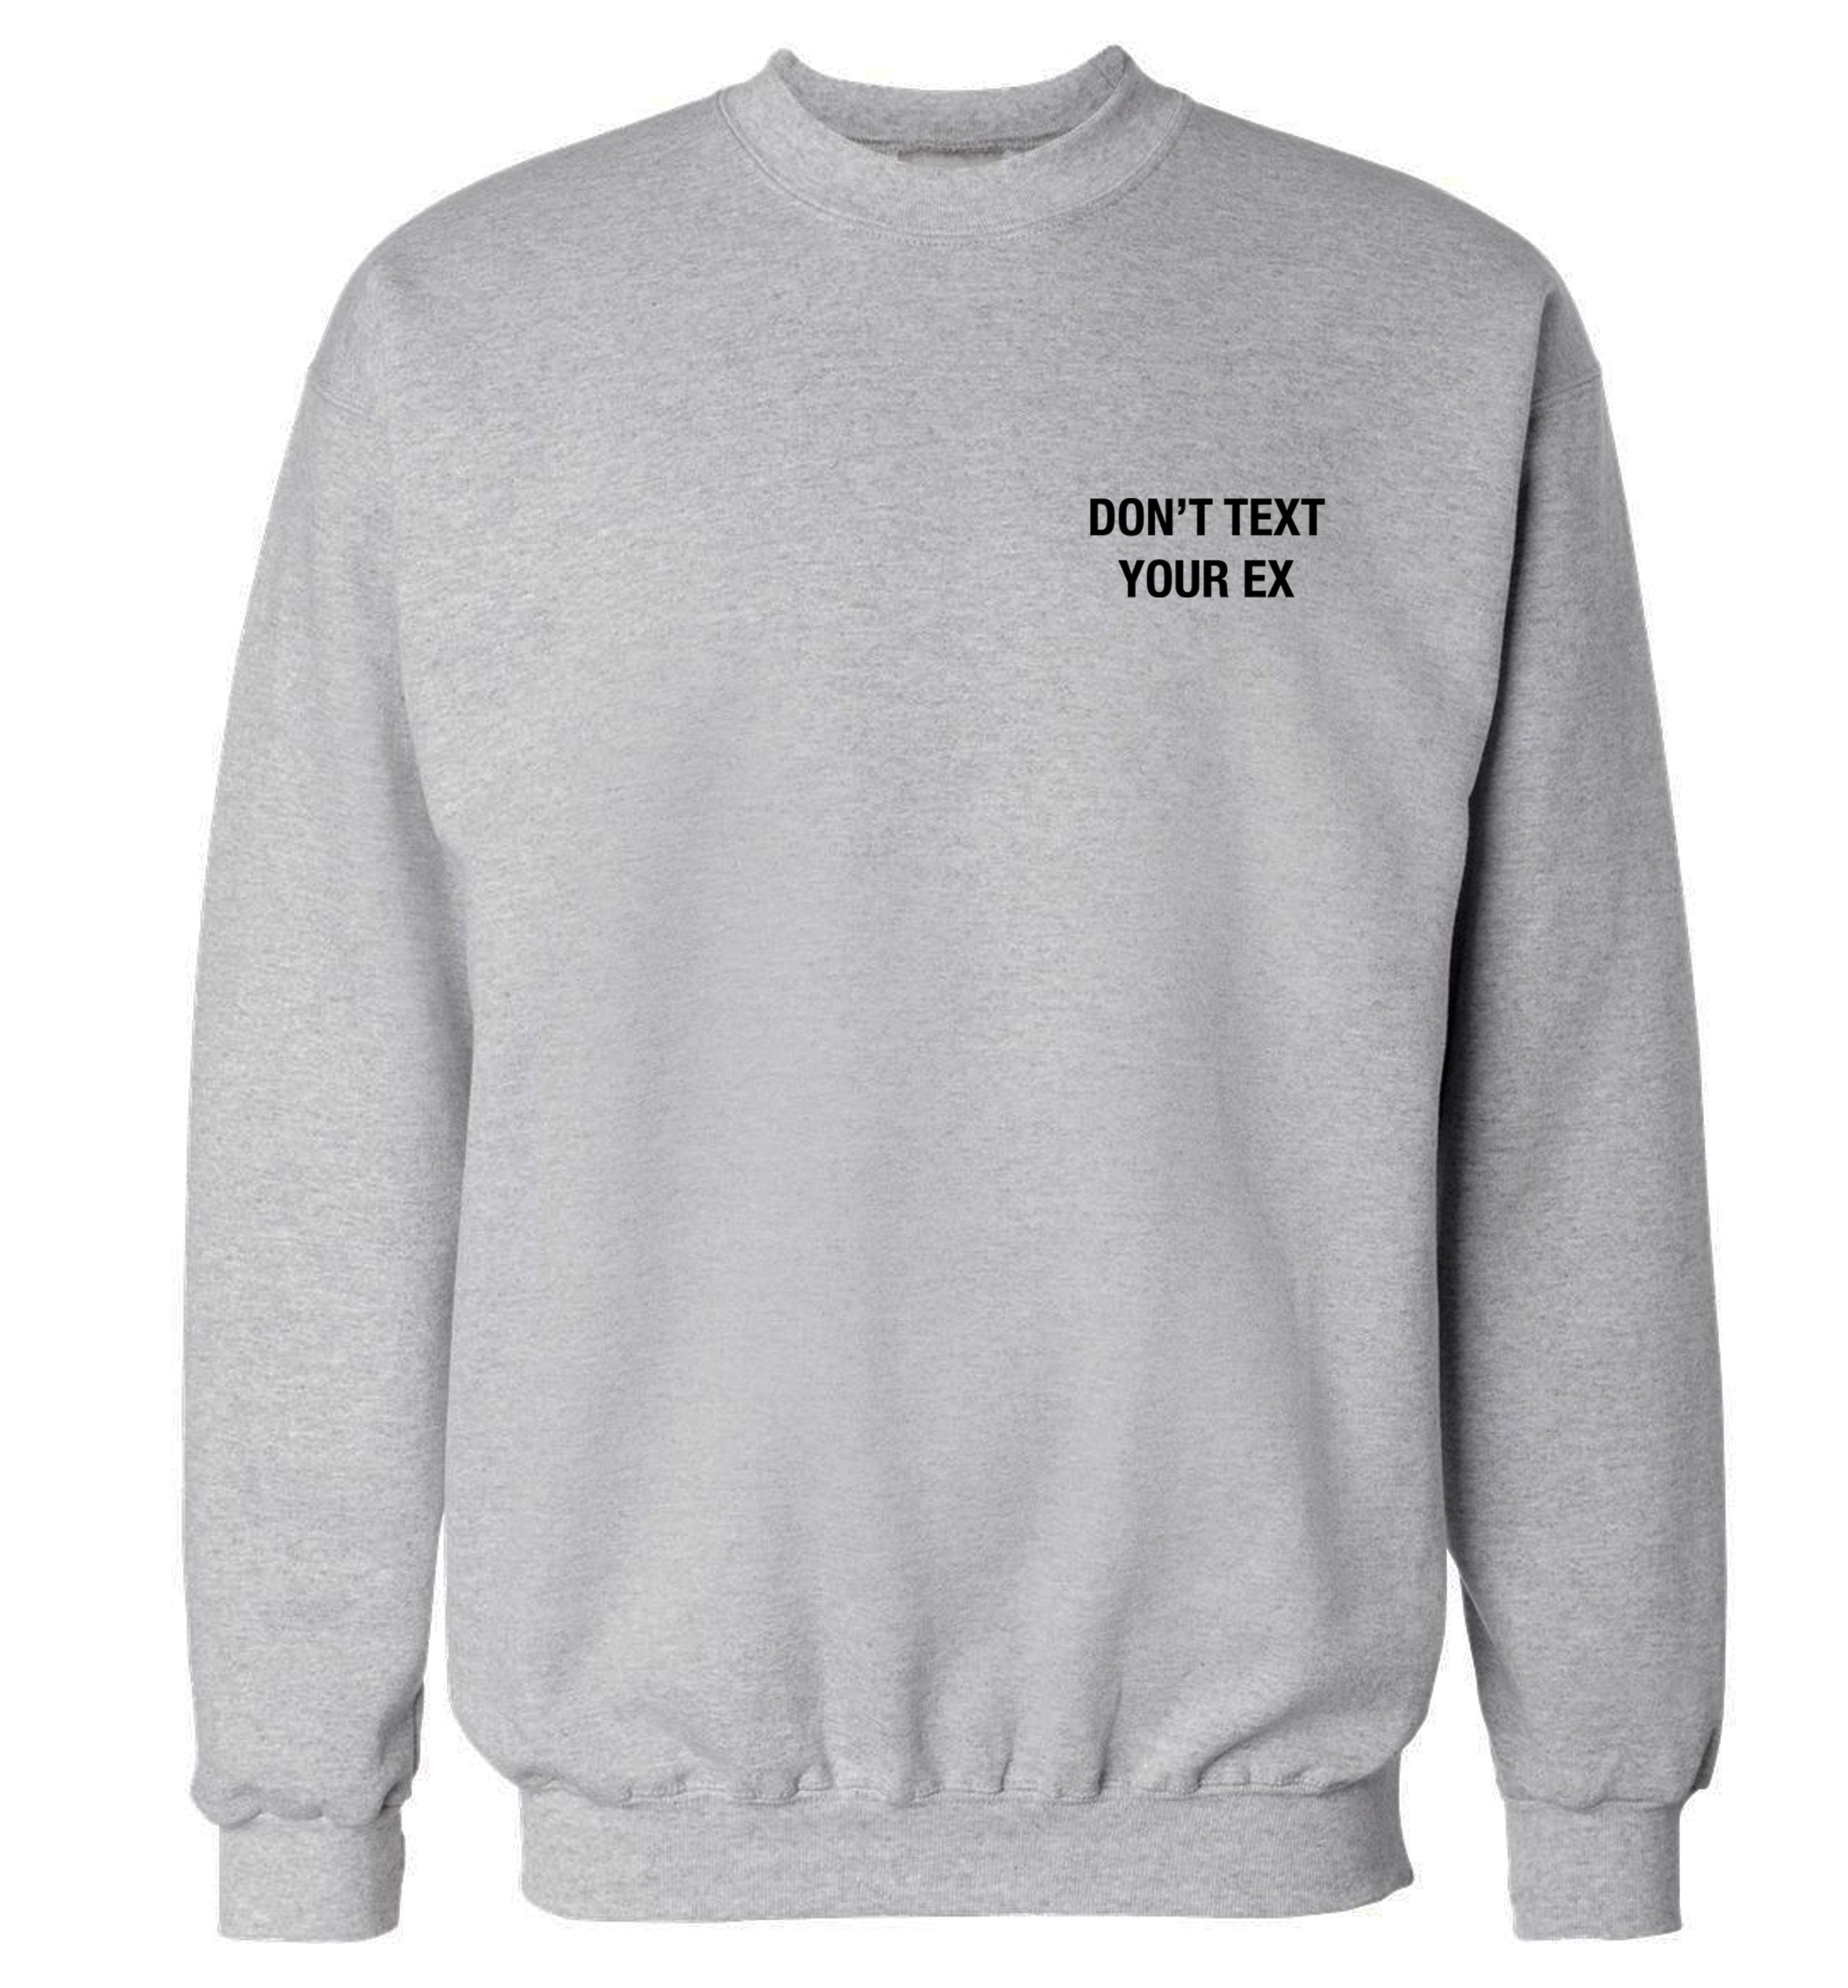 2019 year lifestyle- Shirt tumblr designs hipster photo